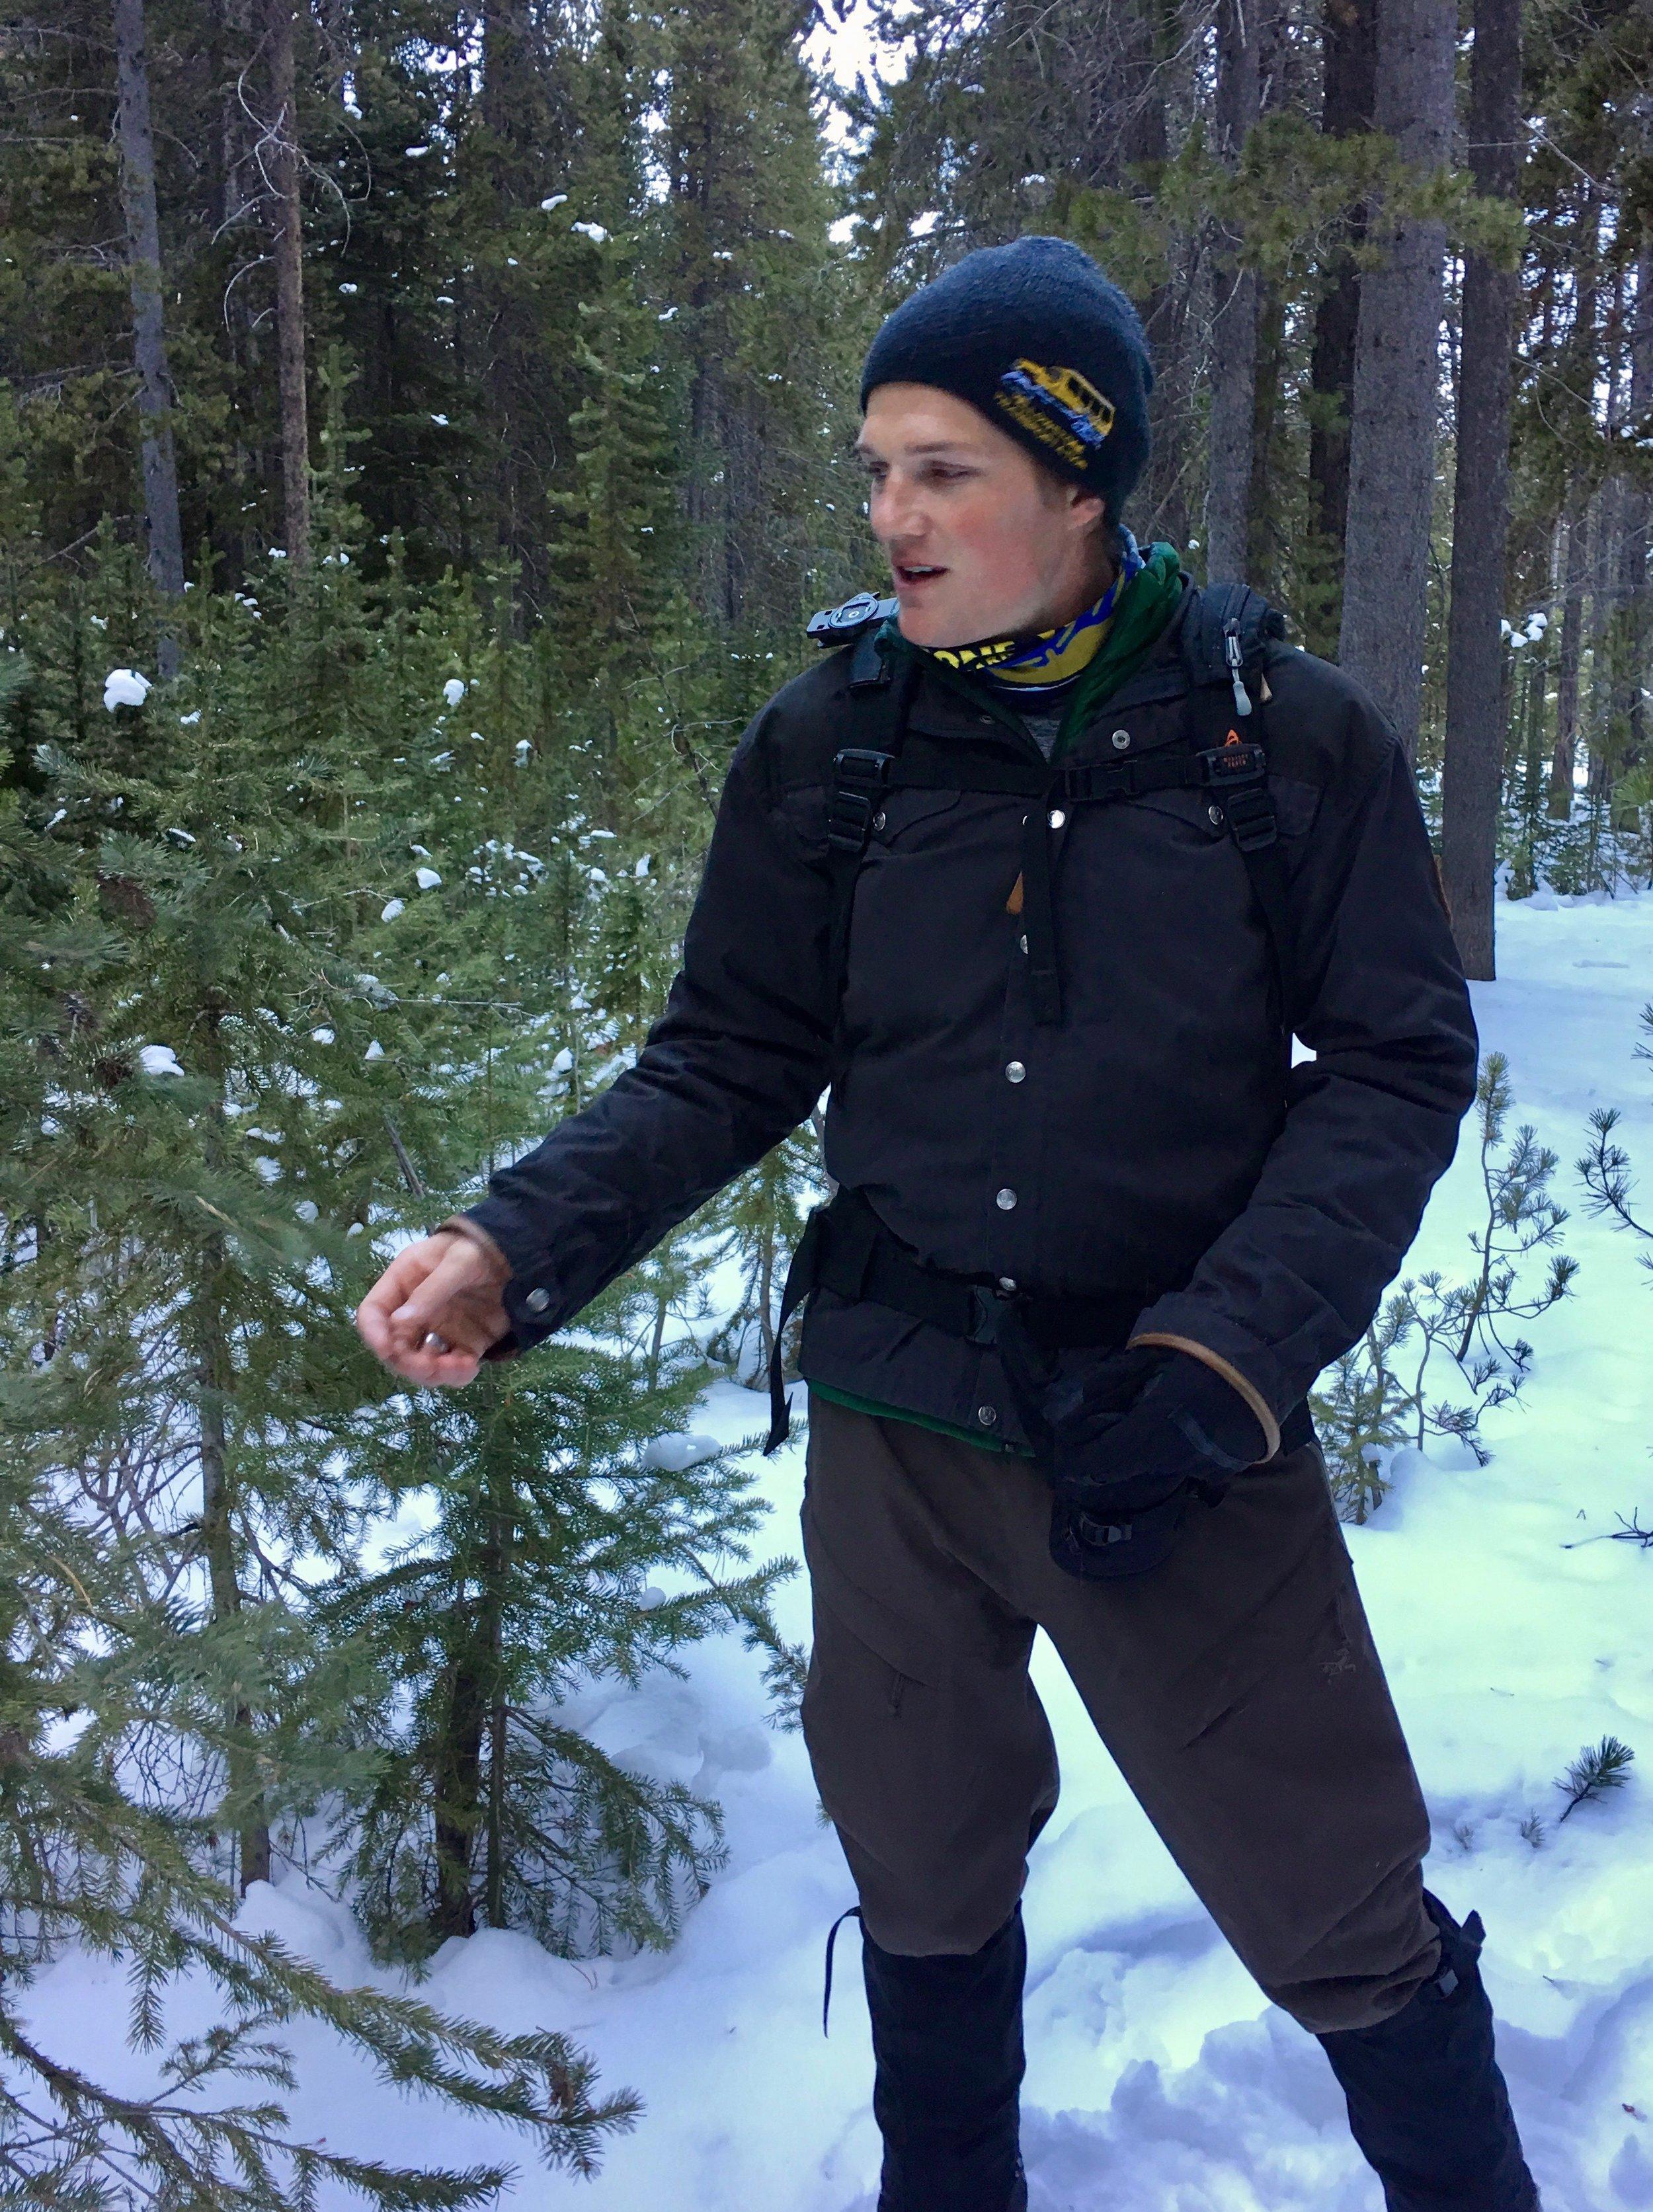 Gregor, our Snowshoe Guide